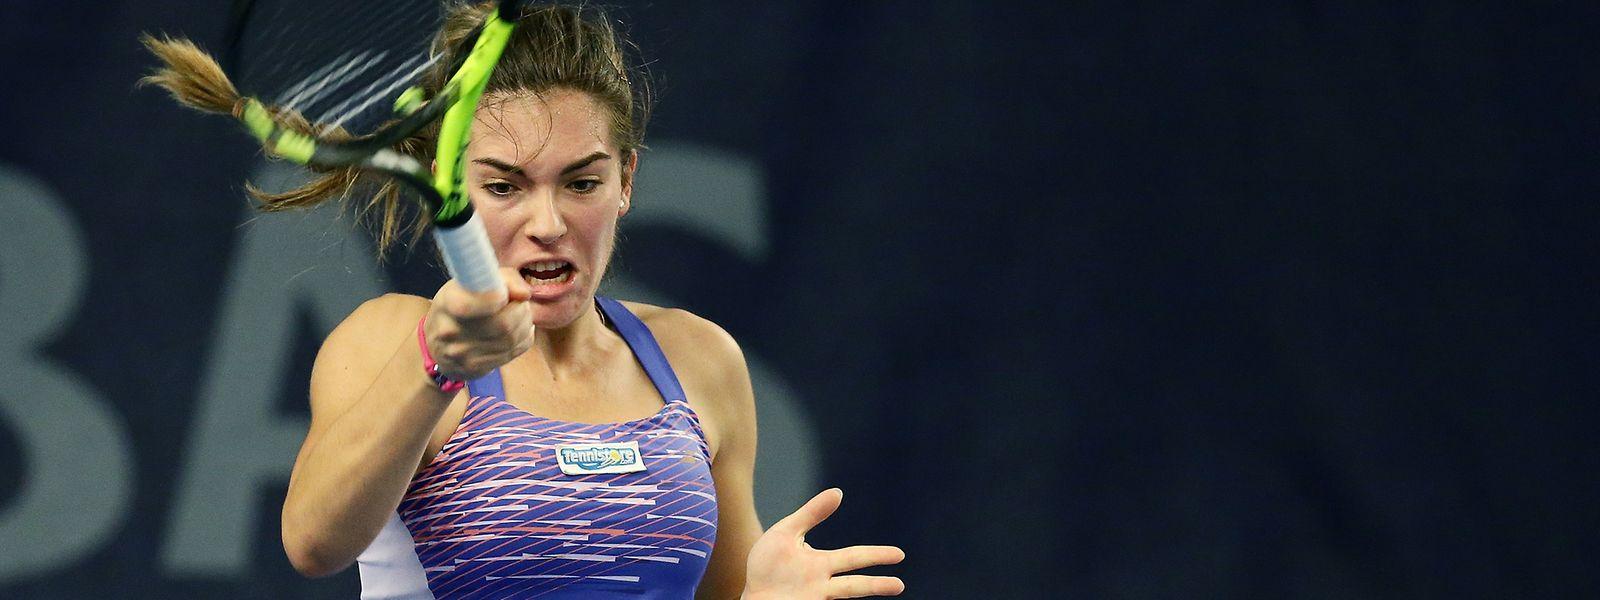 Eléonora Molinaro disputera la demi-finale du tournoi de Grenoble, ce samedi